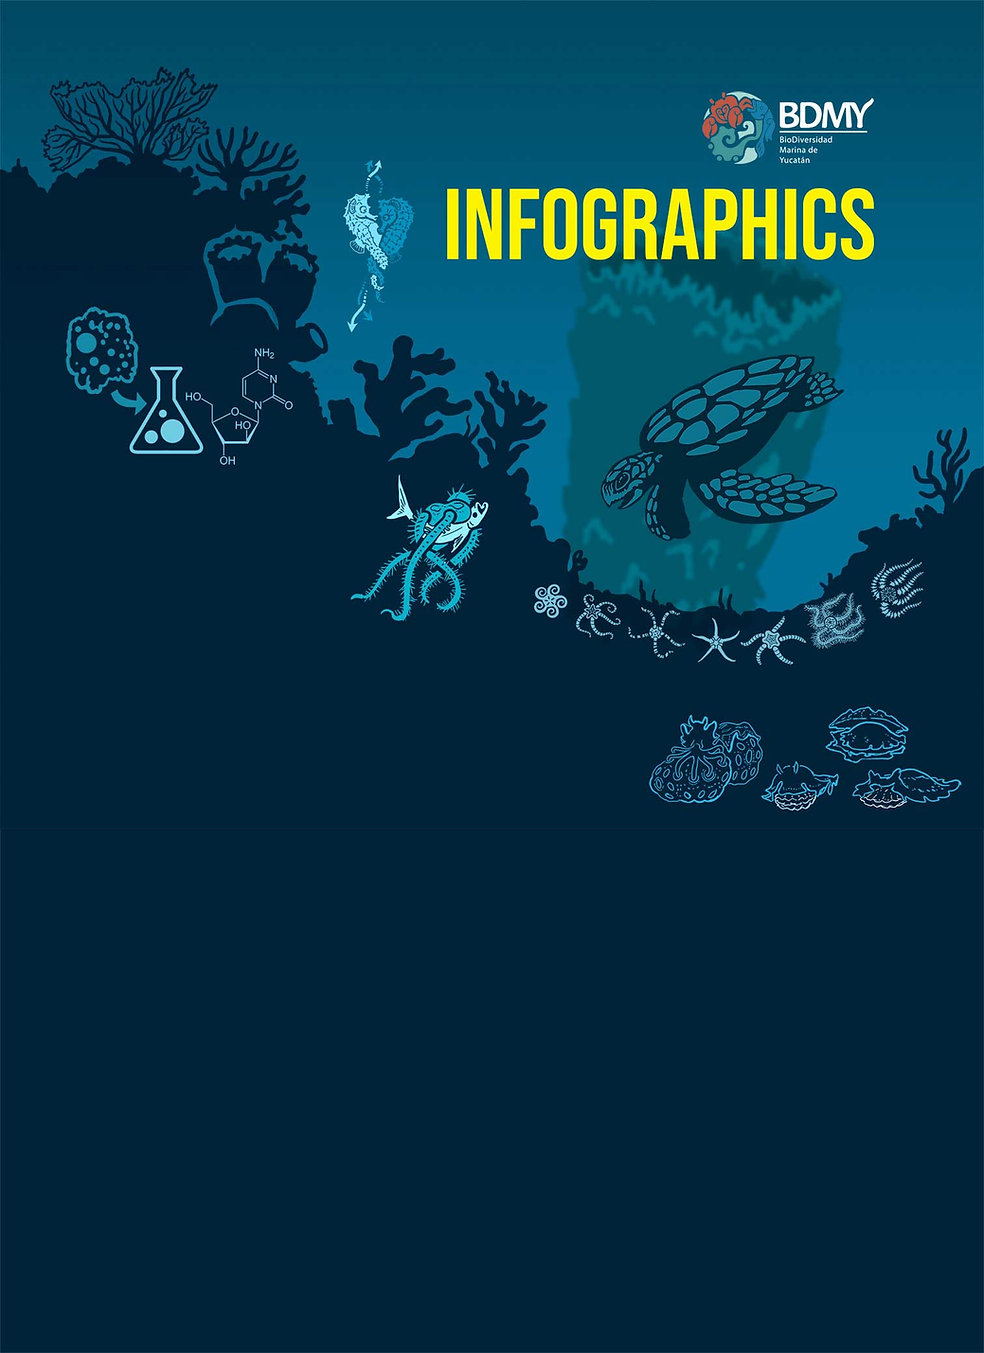 Landin-page-Infographics-03.jpg